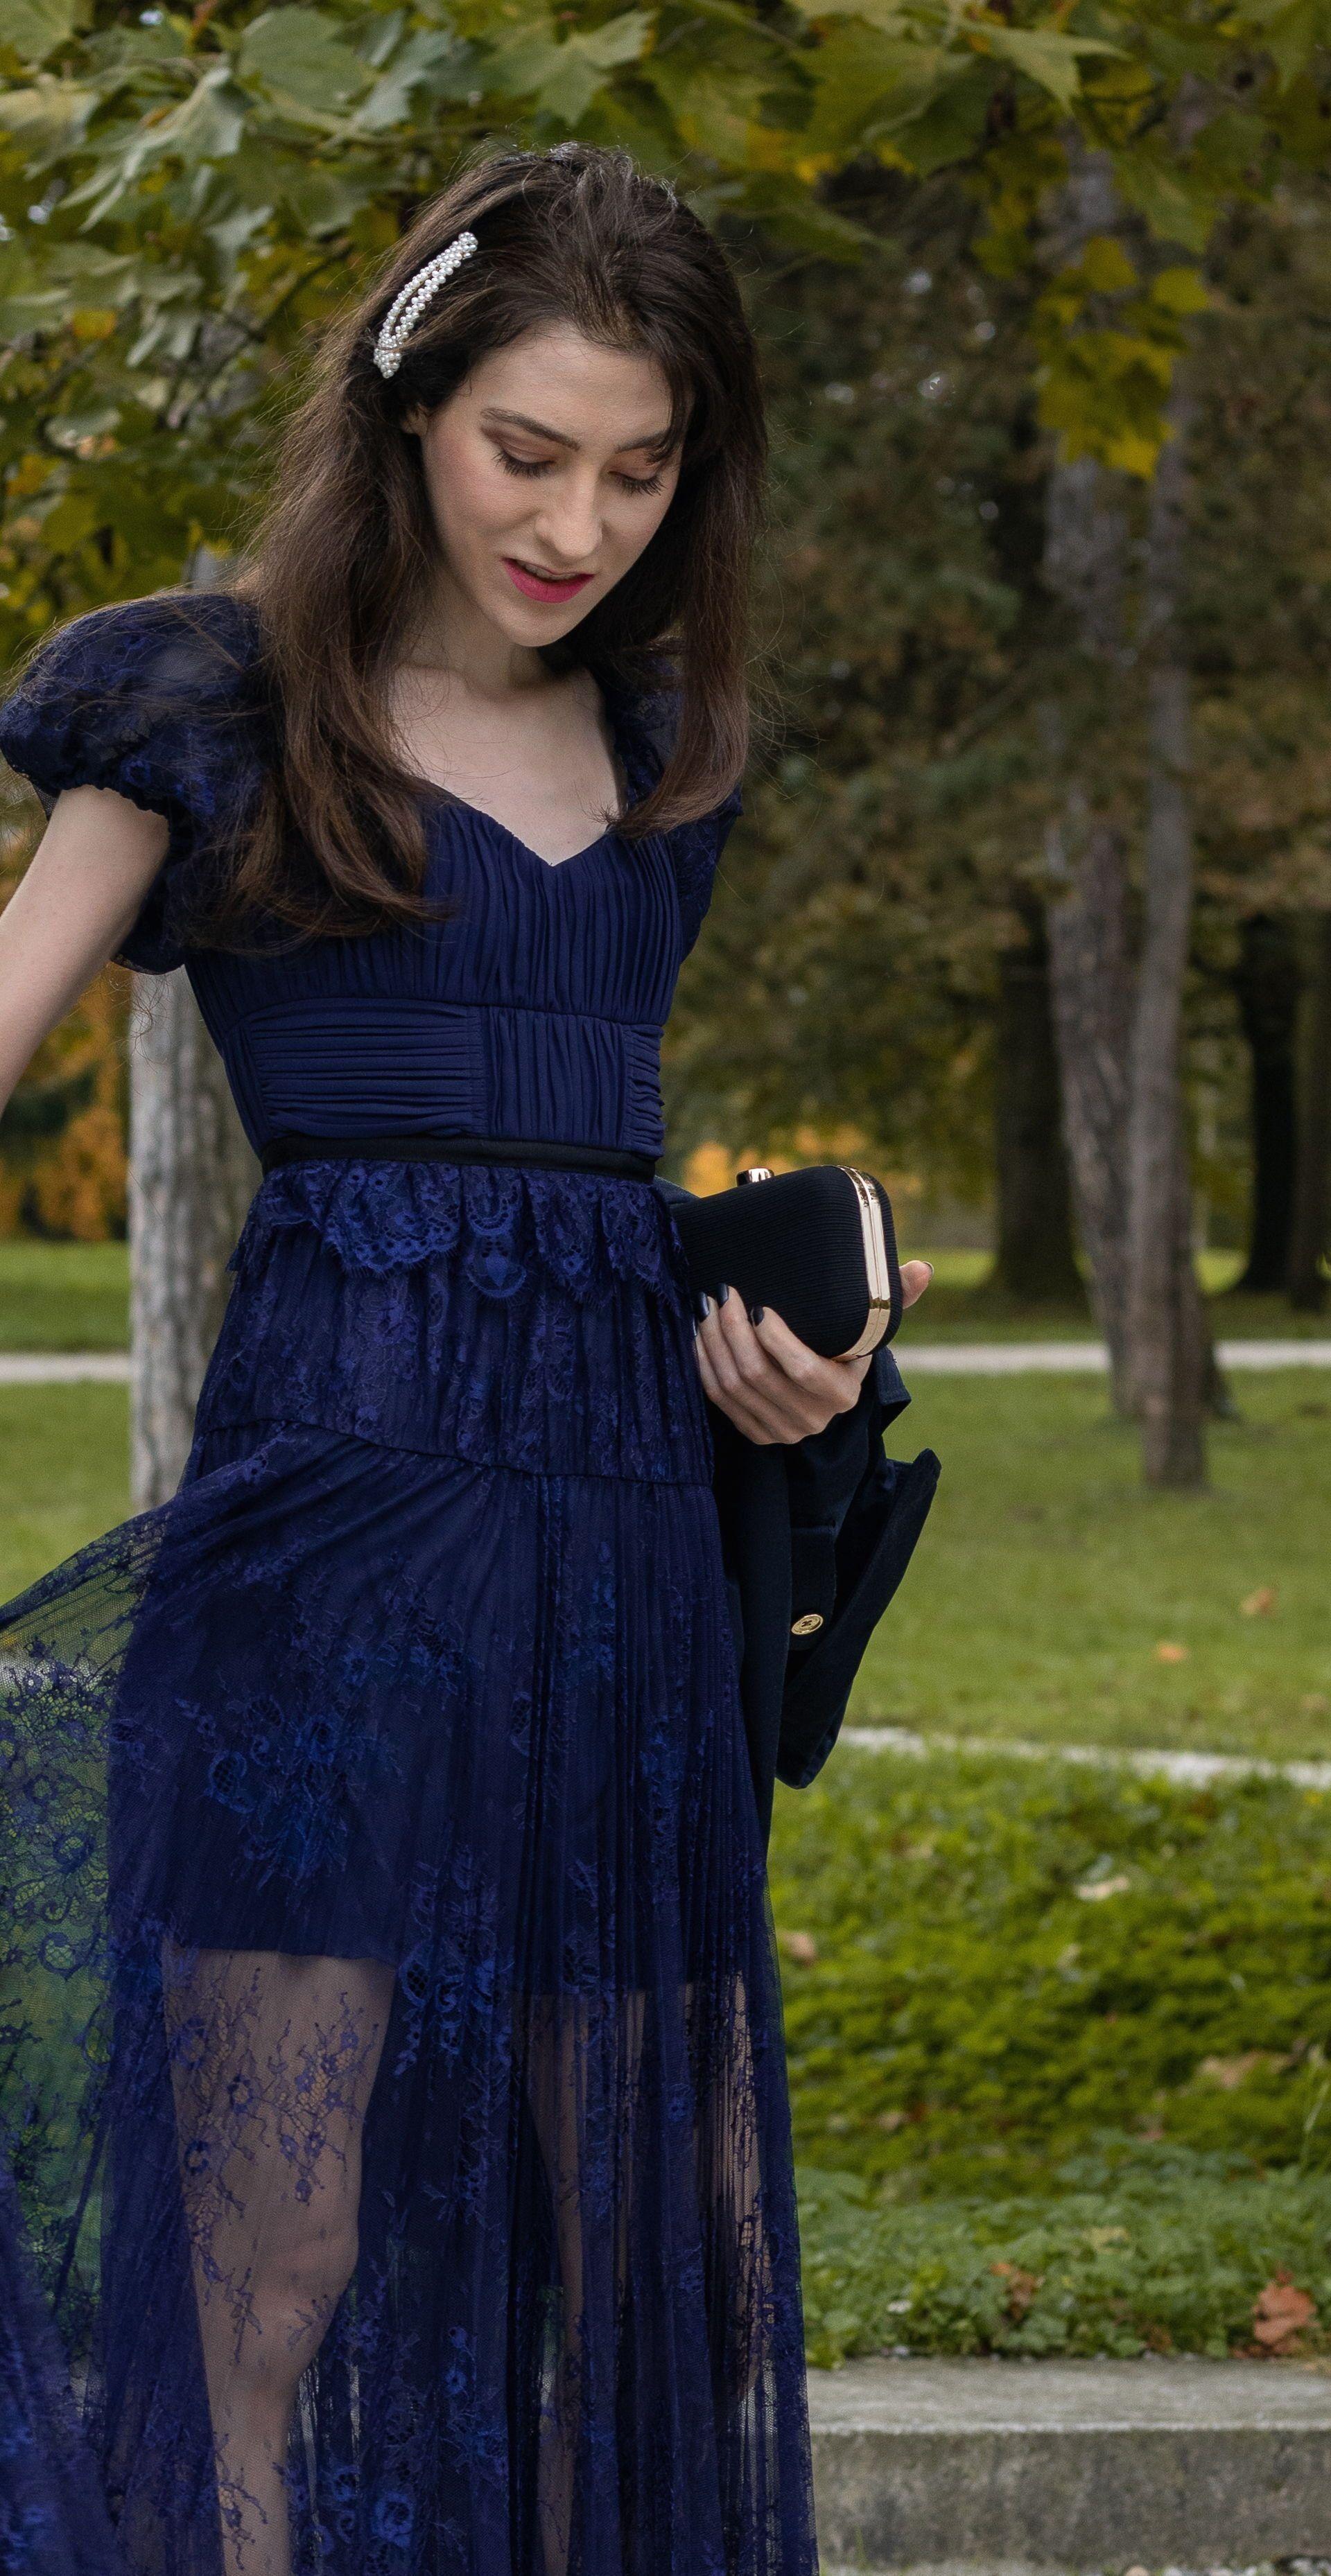 Blacktie wedding guest dress for fall wedding